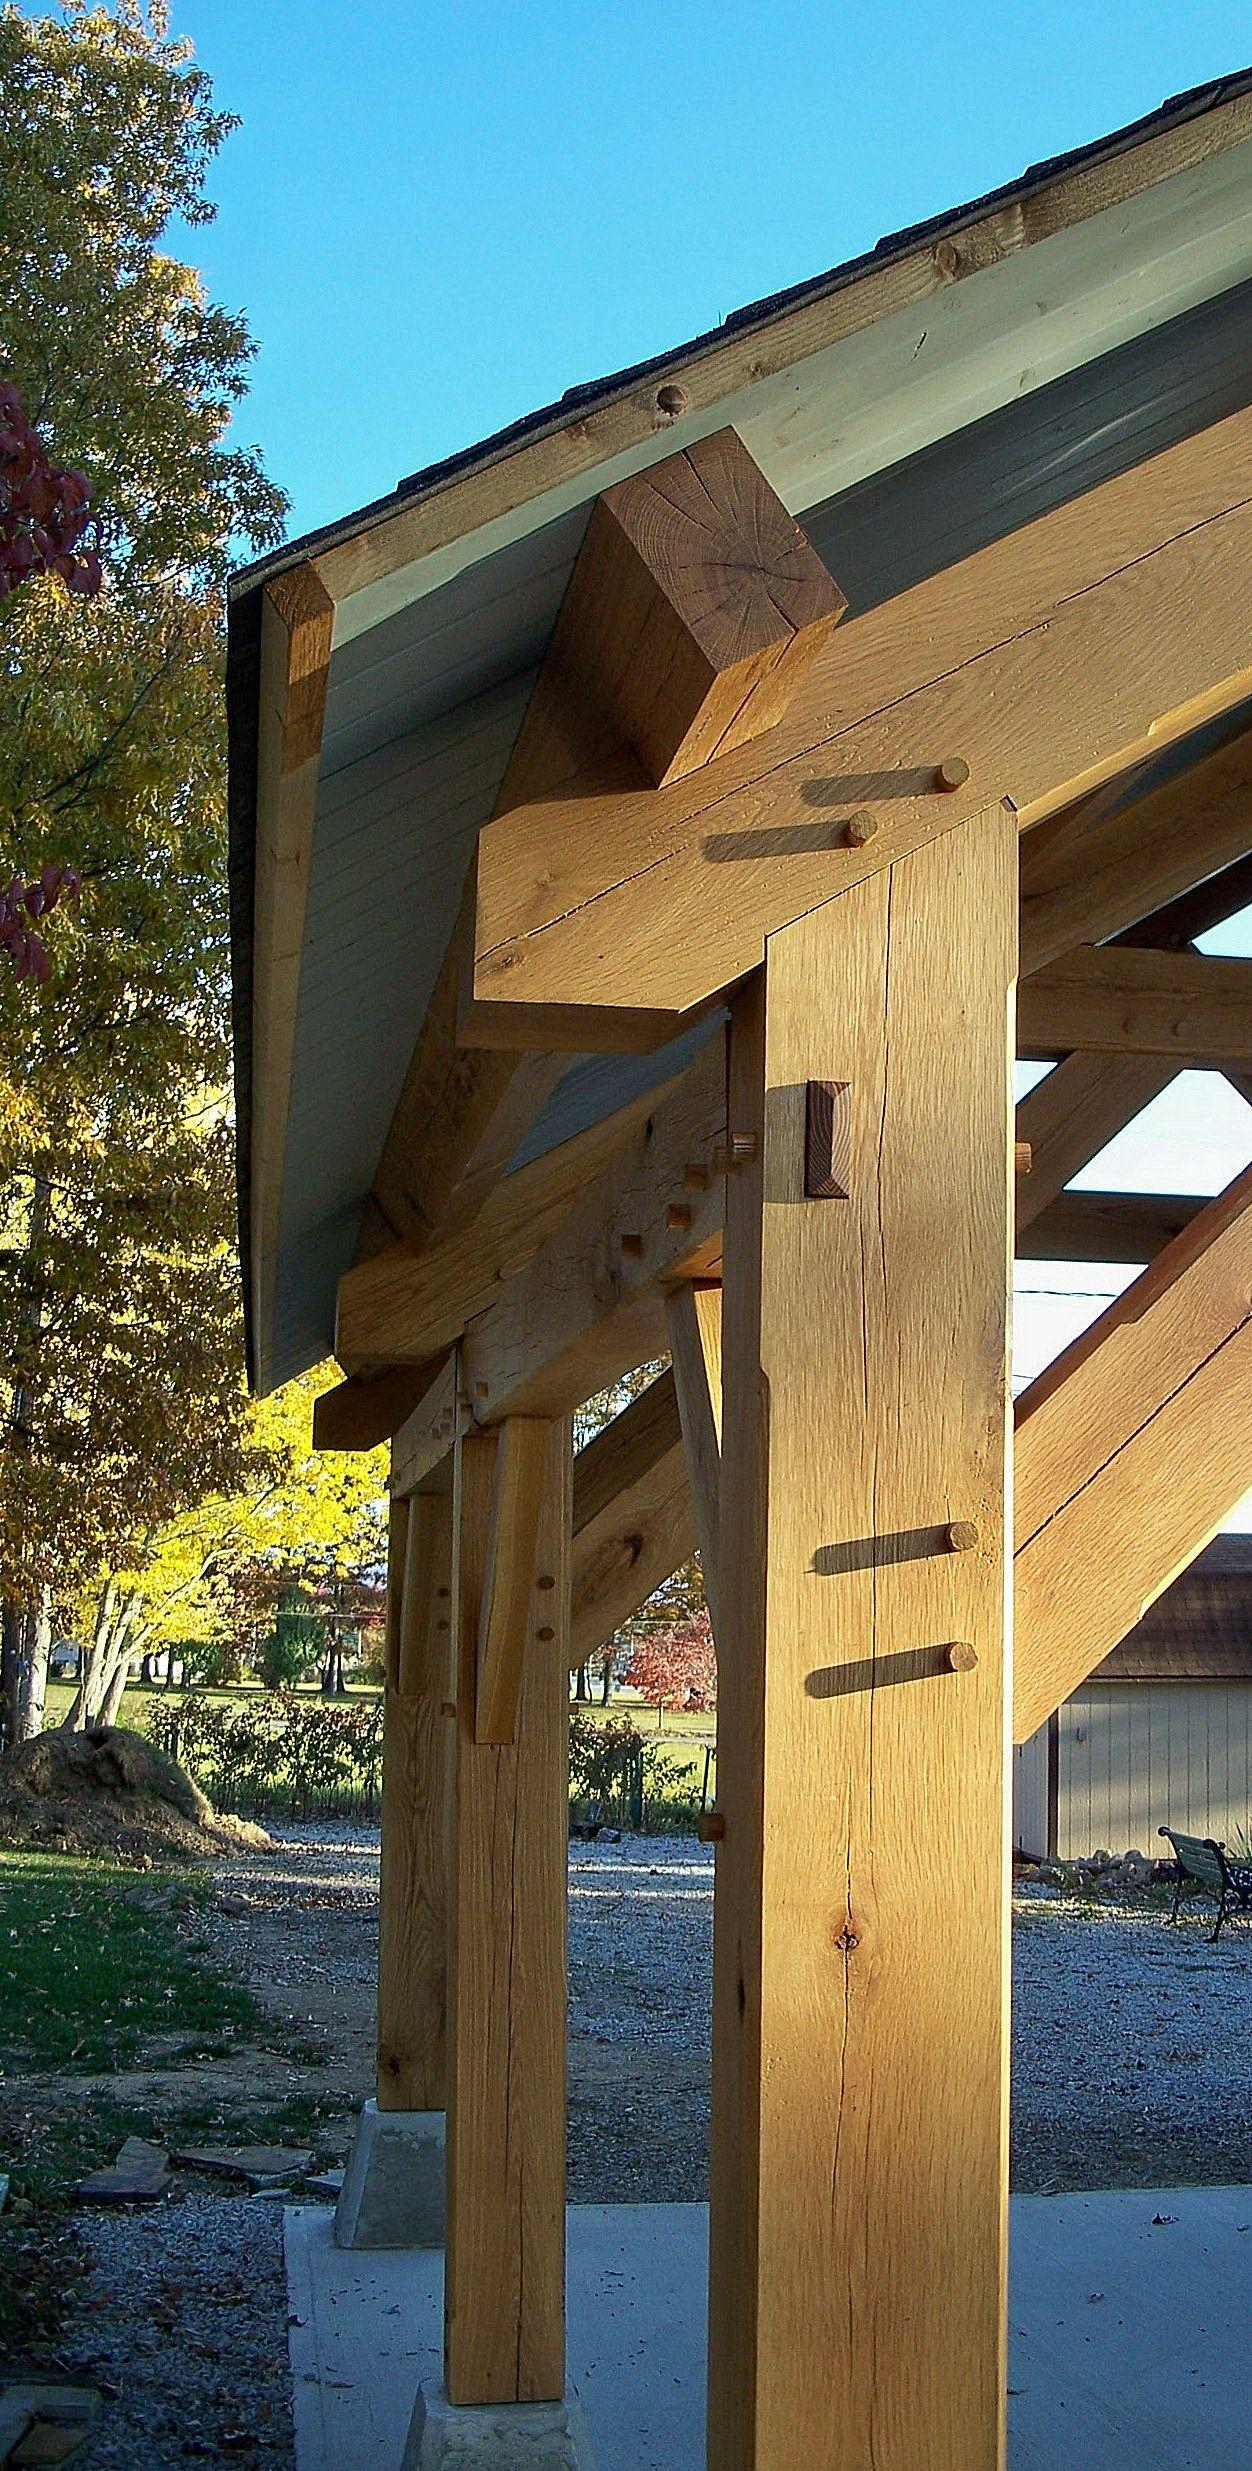 Timber Frames Homestead Timber Frames Crossville Tn Timber Framing Timber Frame Construction Timber Frame Joinery